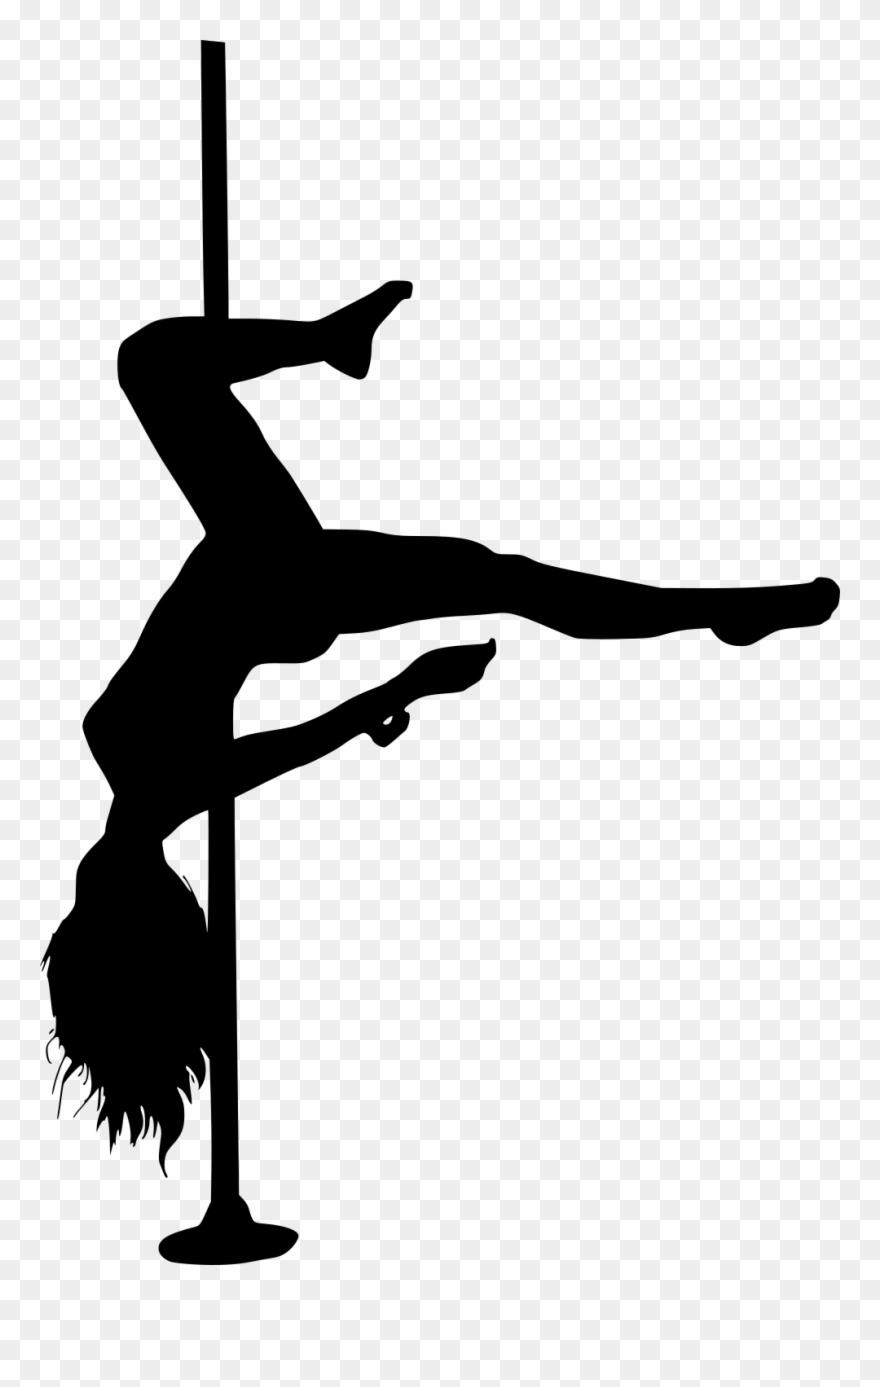 Athletic dance move,Pole dance,Dance,Performing arts,Dancer